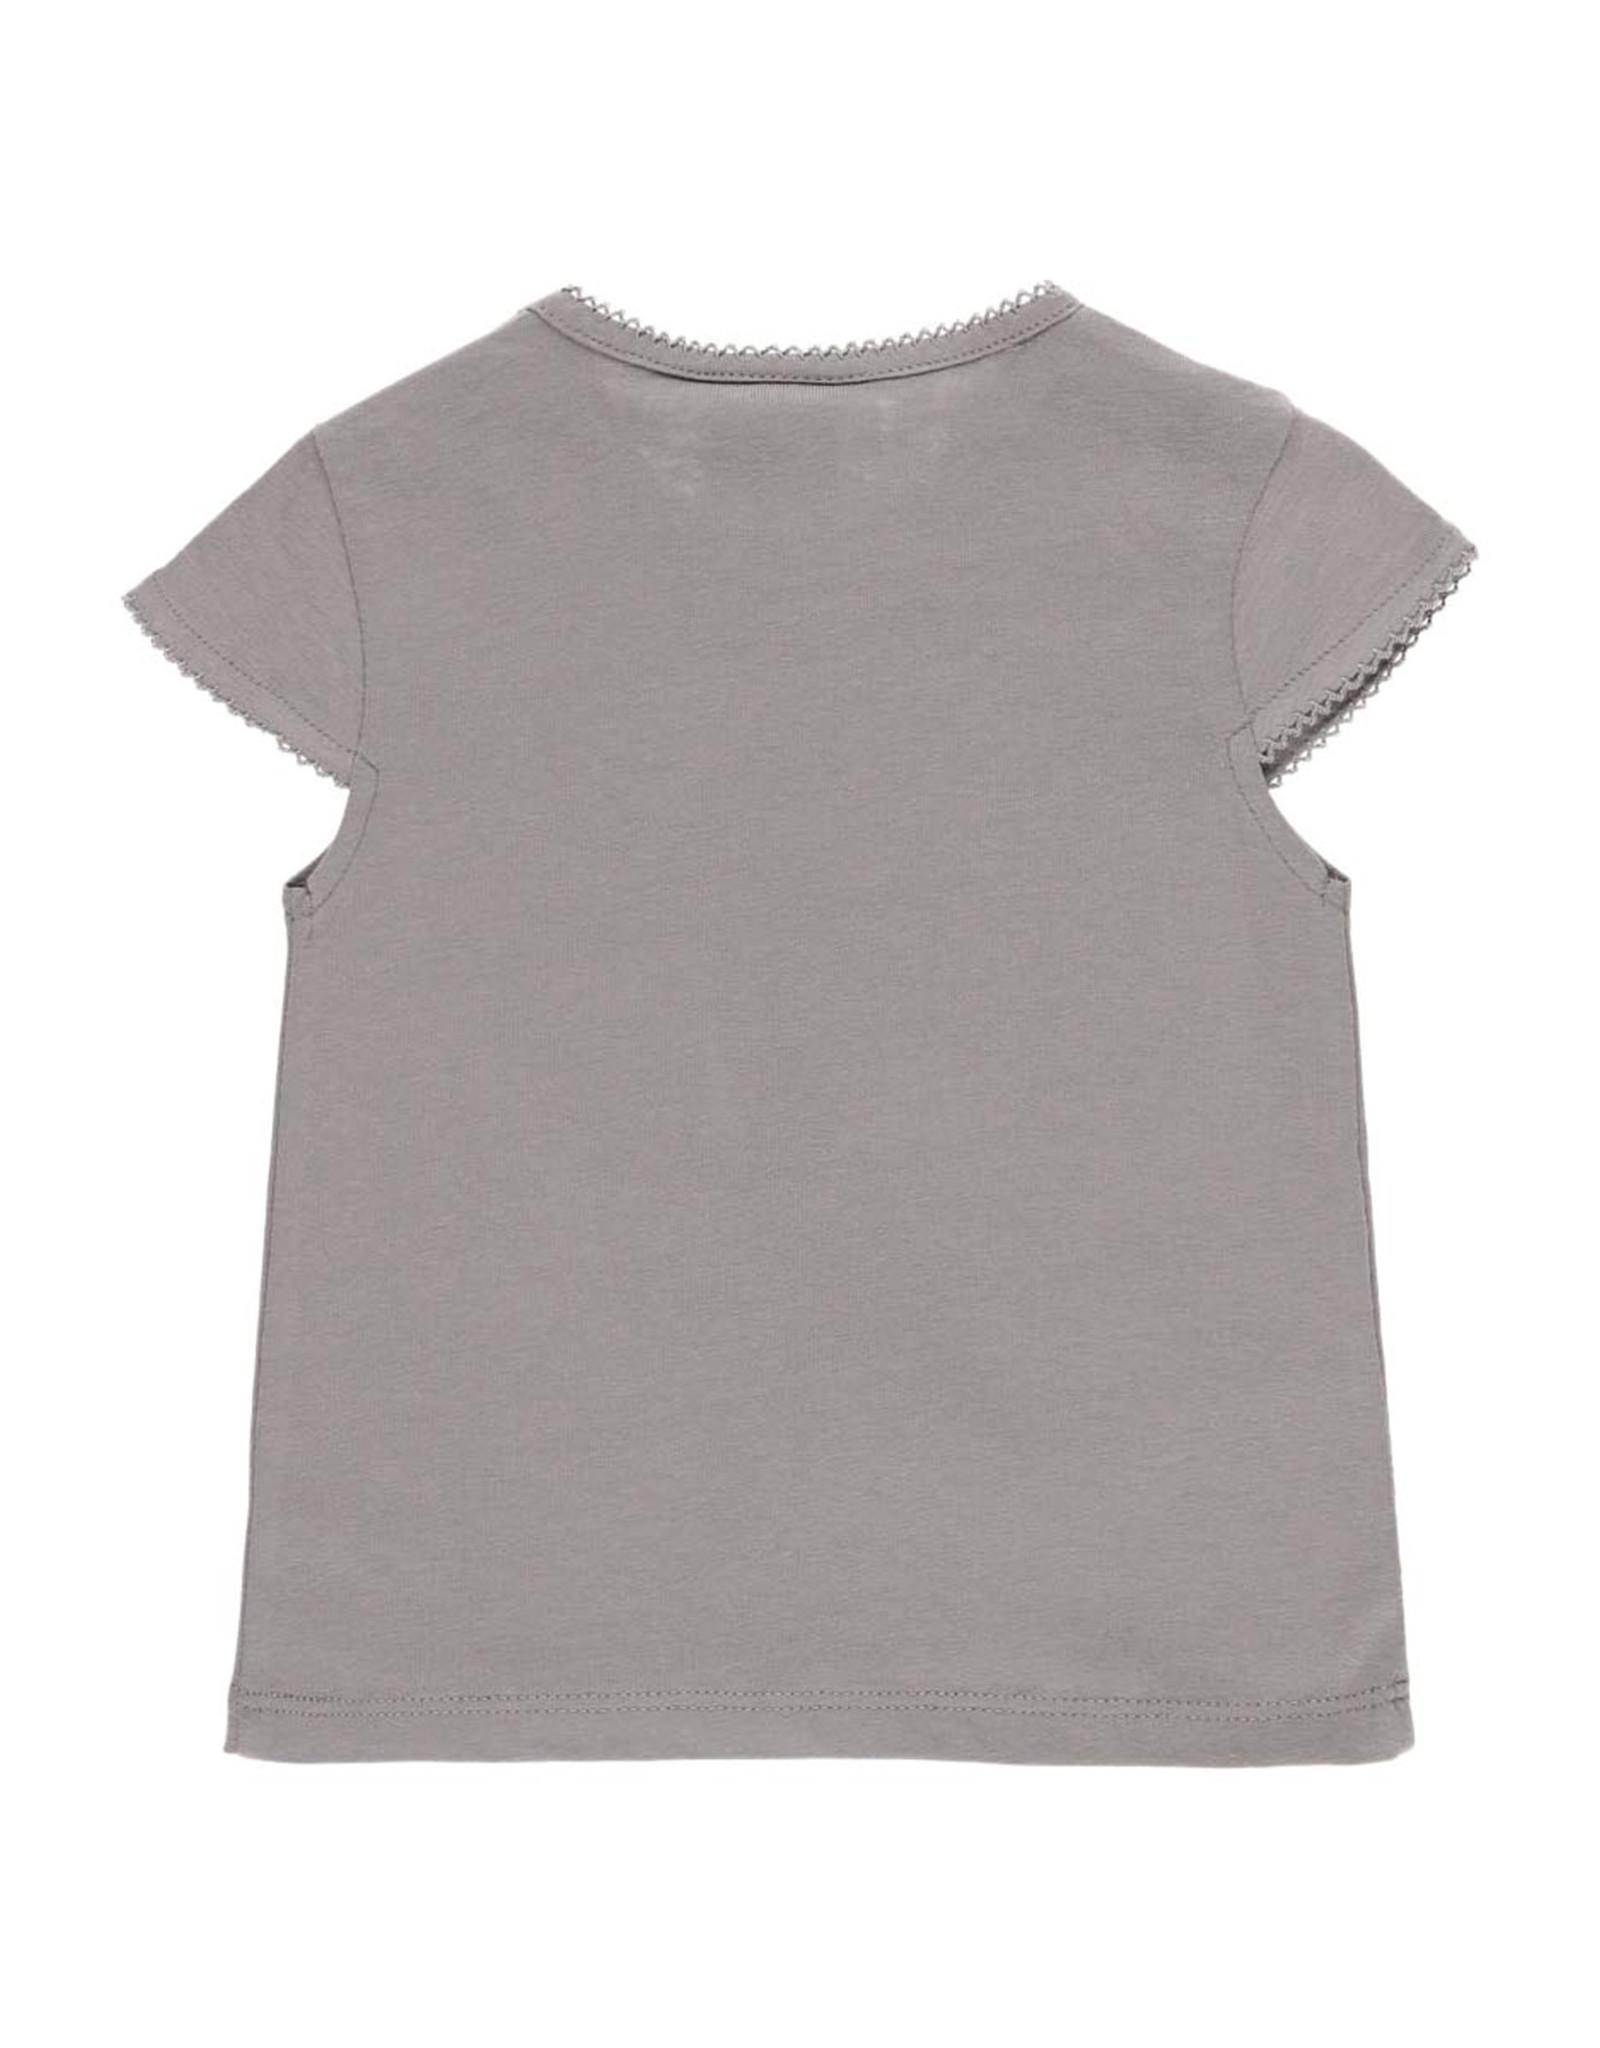 Boboli Flamingo Tee Shirt, Gray